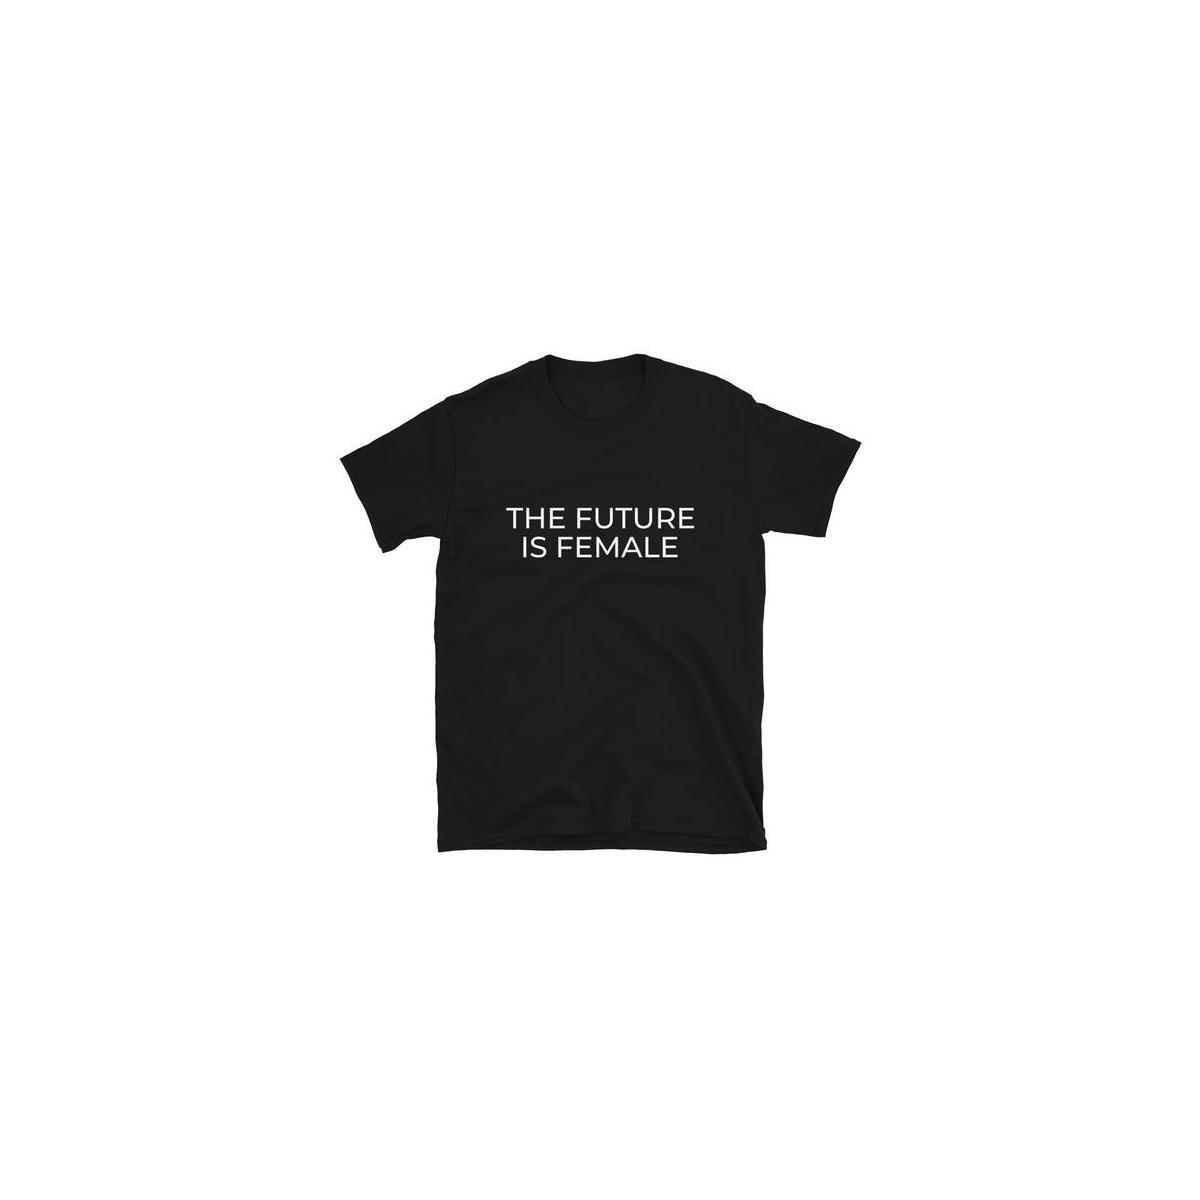 The Future is Female Feminist Unisex Shirt (Sizes S-XL)